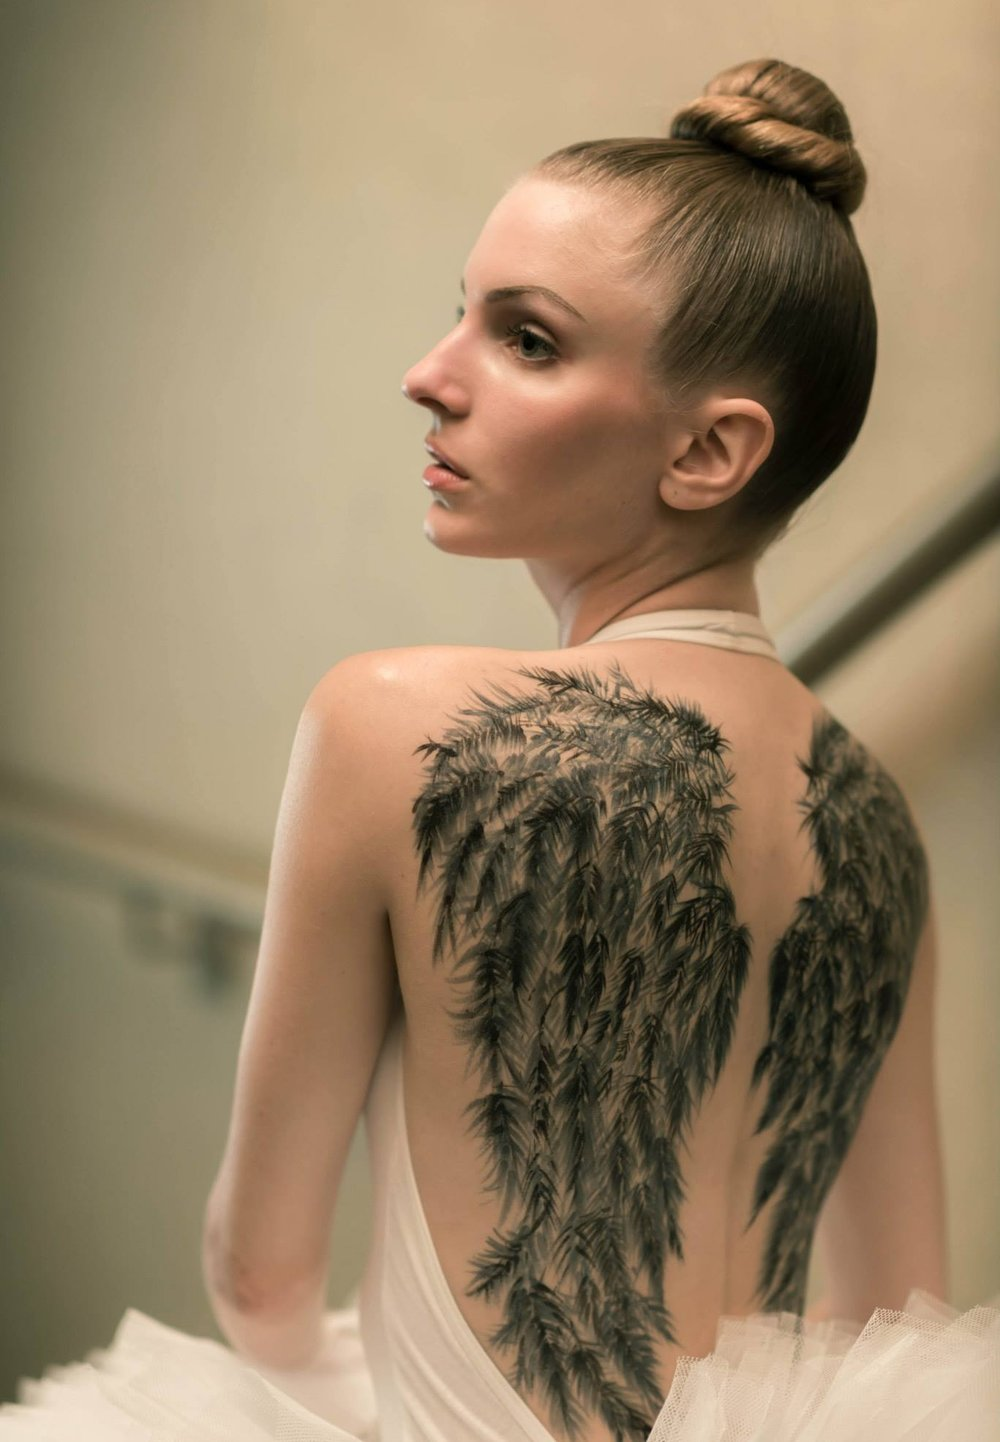 Model:Christie Halina Romanowski Make-up:Aurélie Badie Hair:Vu Hairstylist Nguyen Photography:Welbert Choi Temporary Tattoos:Frederic Carrasco